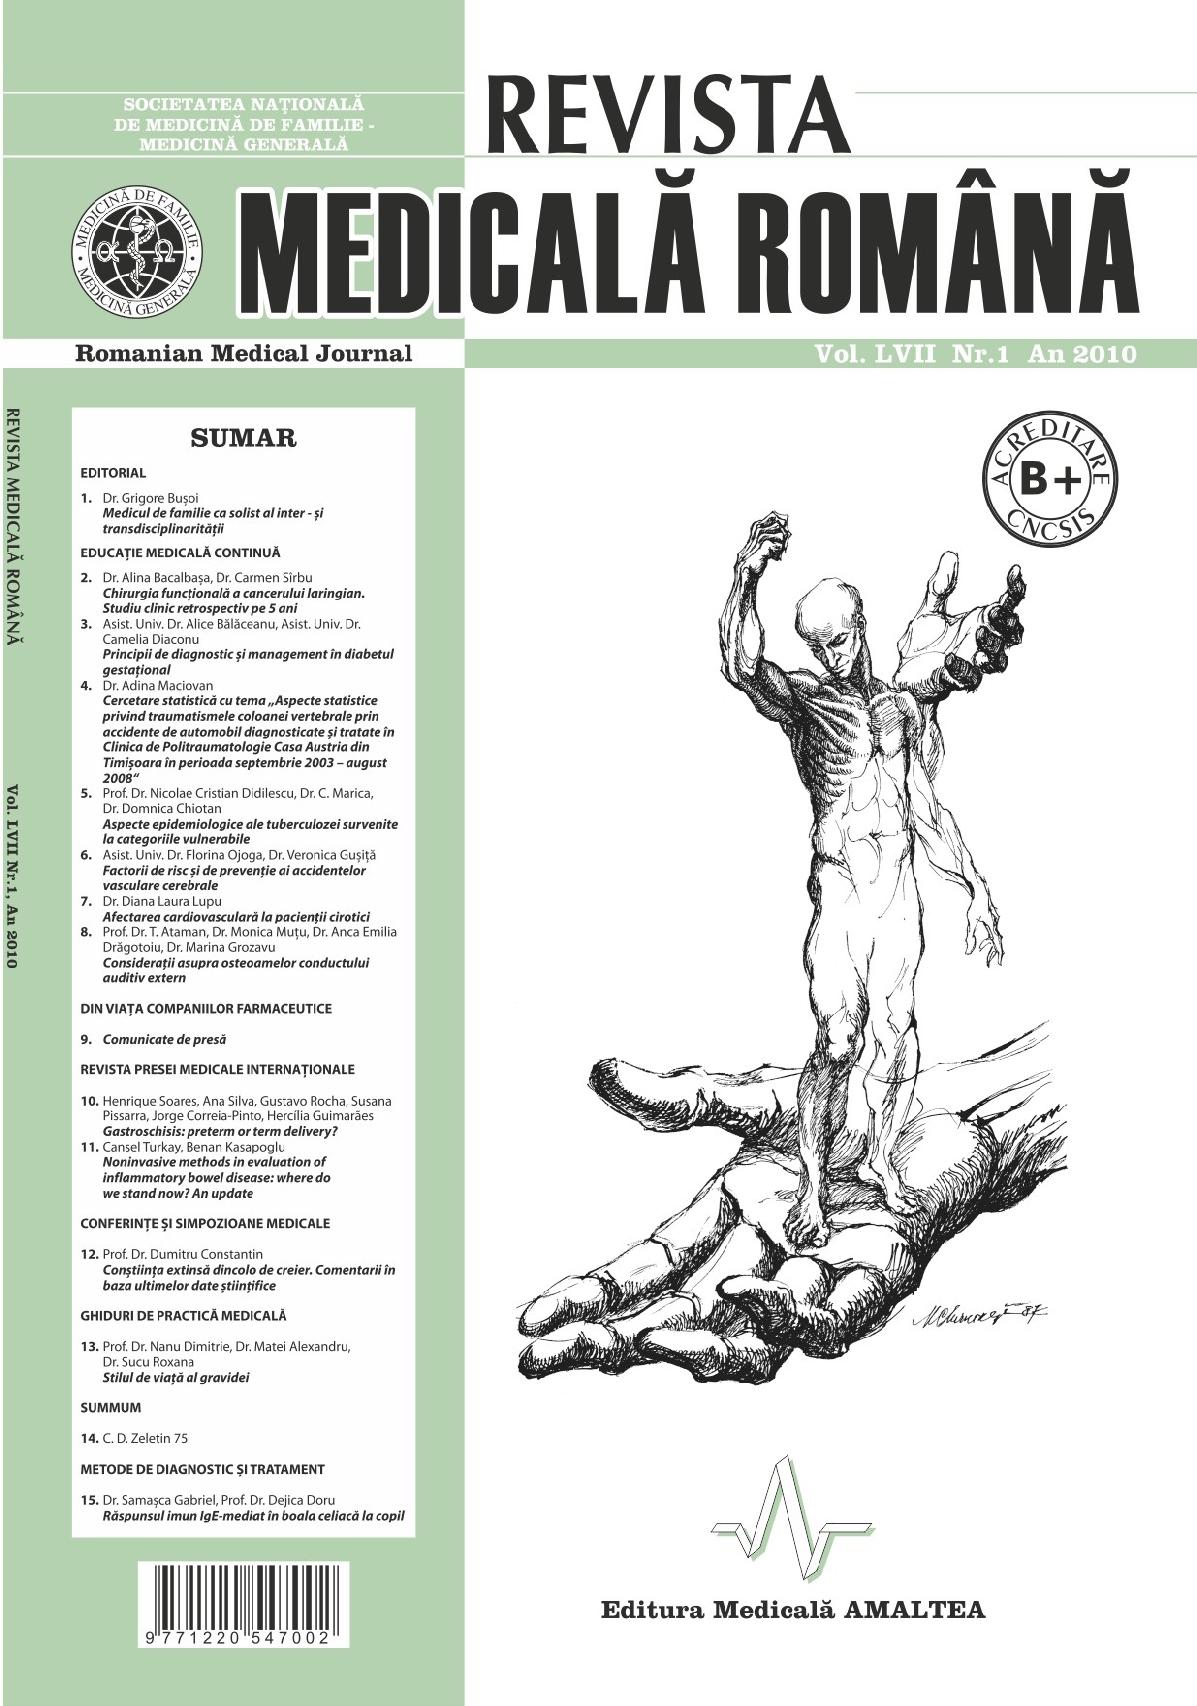 REVISTA MEDICALA ROMANA - Romanian Medical Journal, Vol. LVII, Nr. 1, An 2010